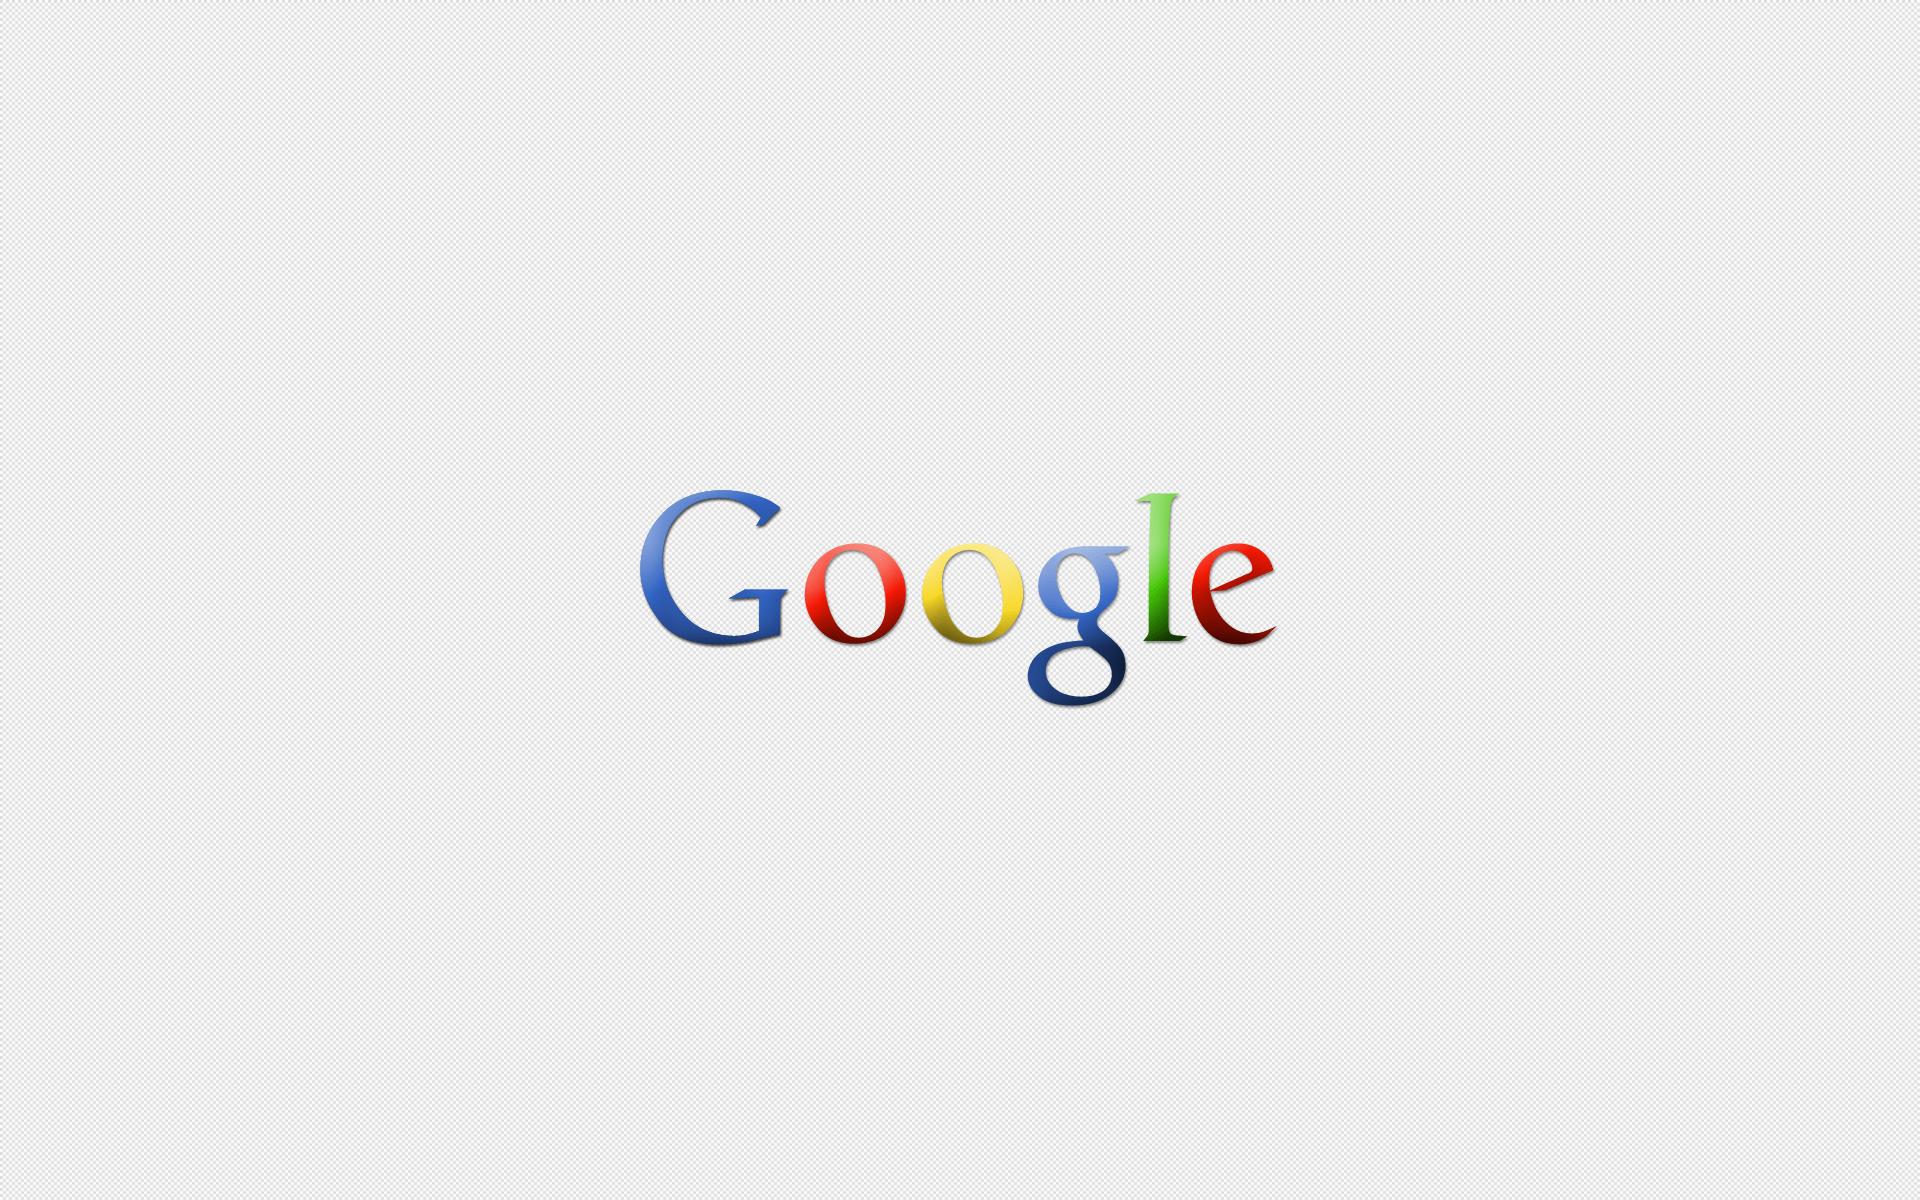 Google HD Wallpapers